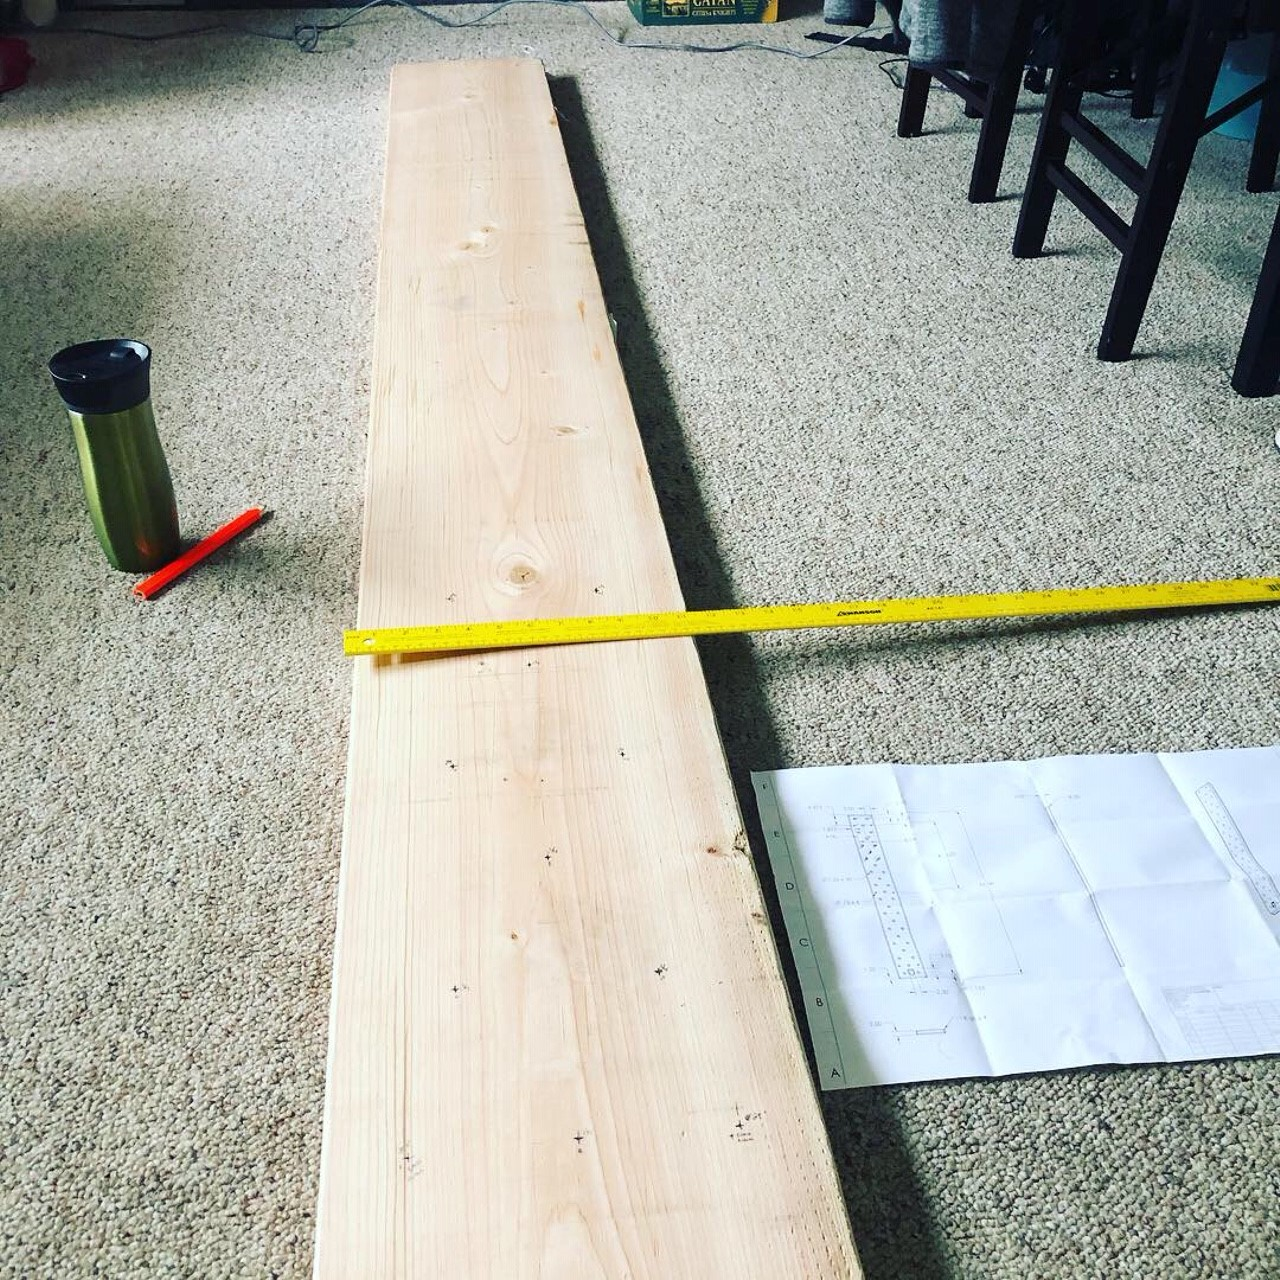 peg board DIY how to 1.jpg